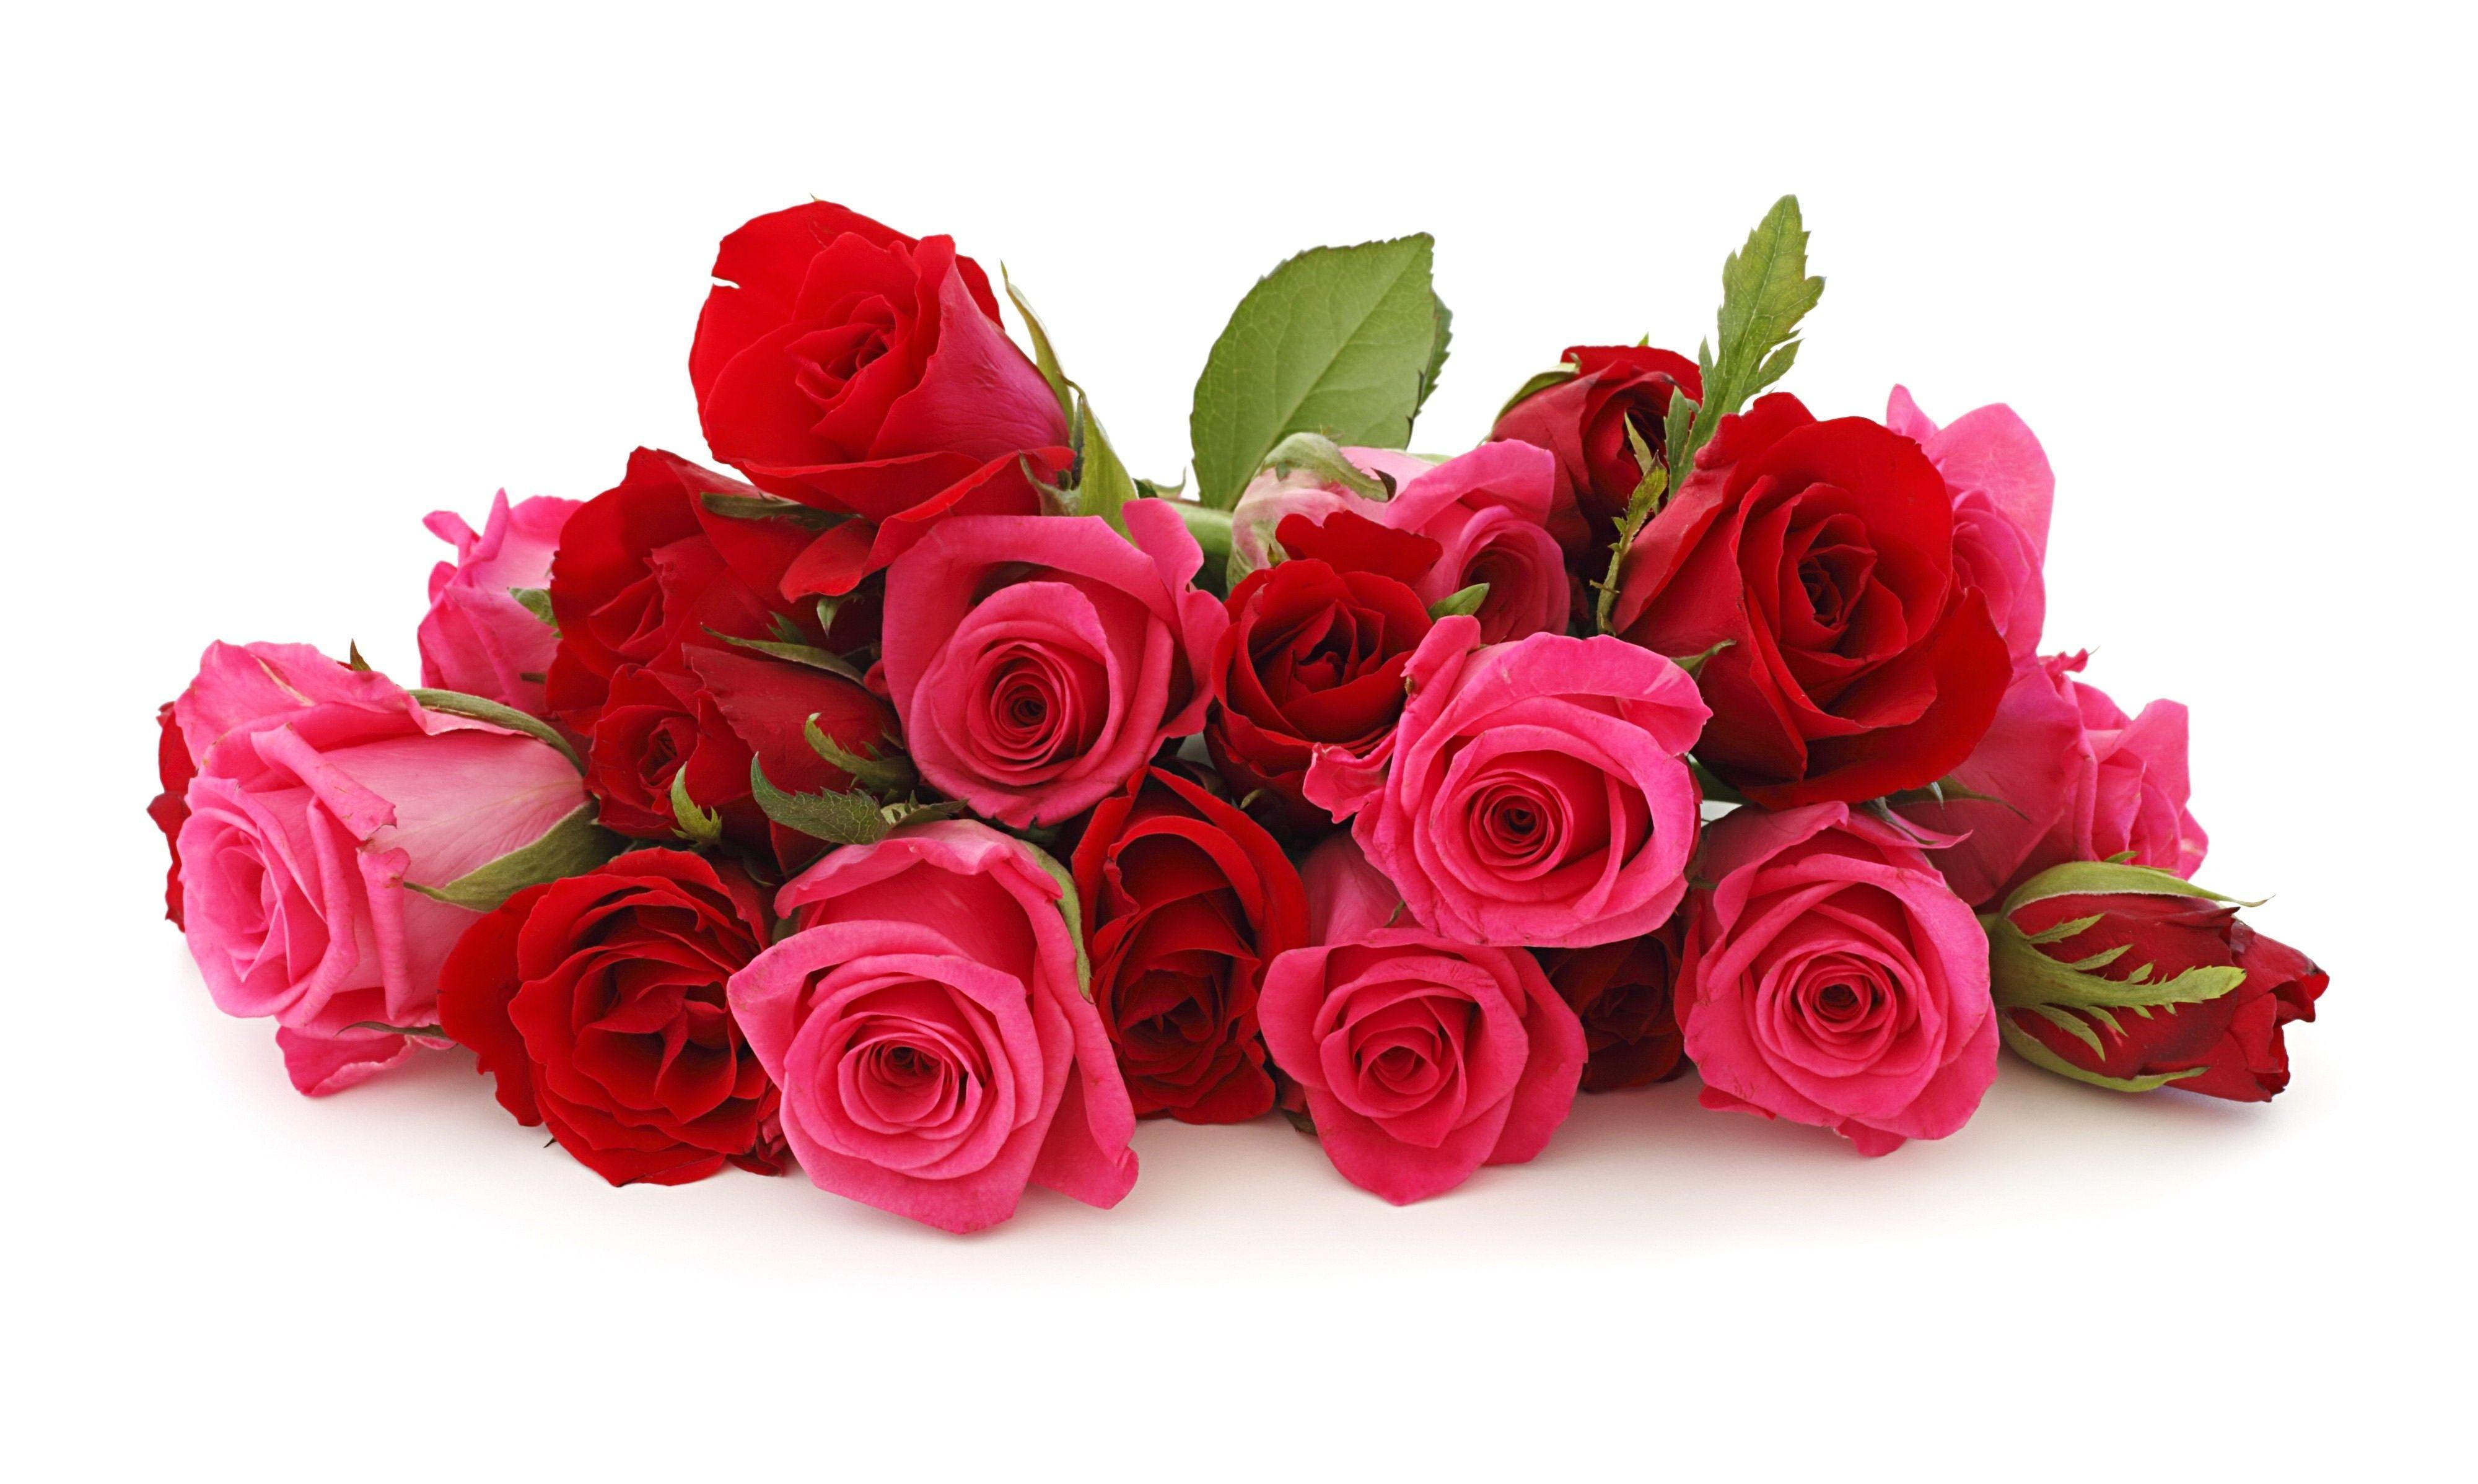 Beautiful Rose Flowers Wallpapers Wallpaper Cave